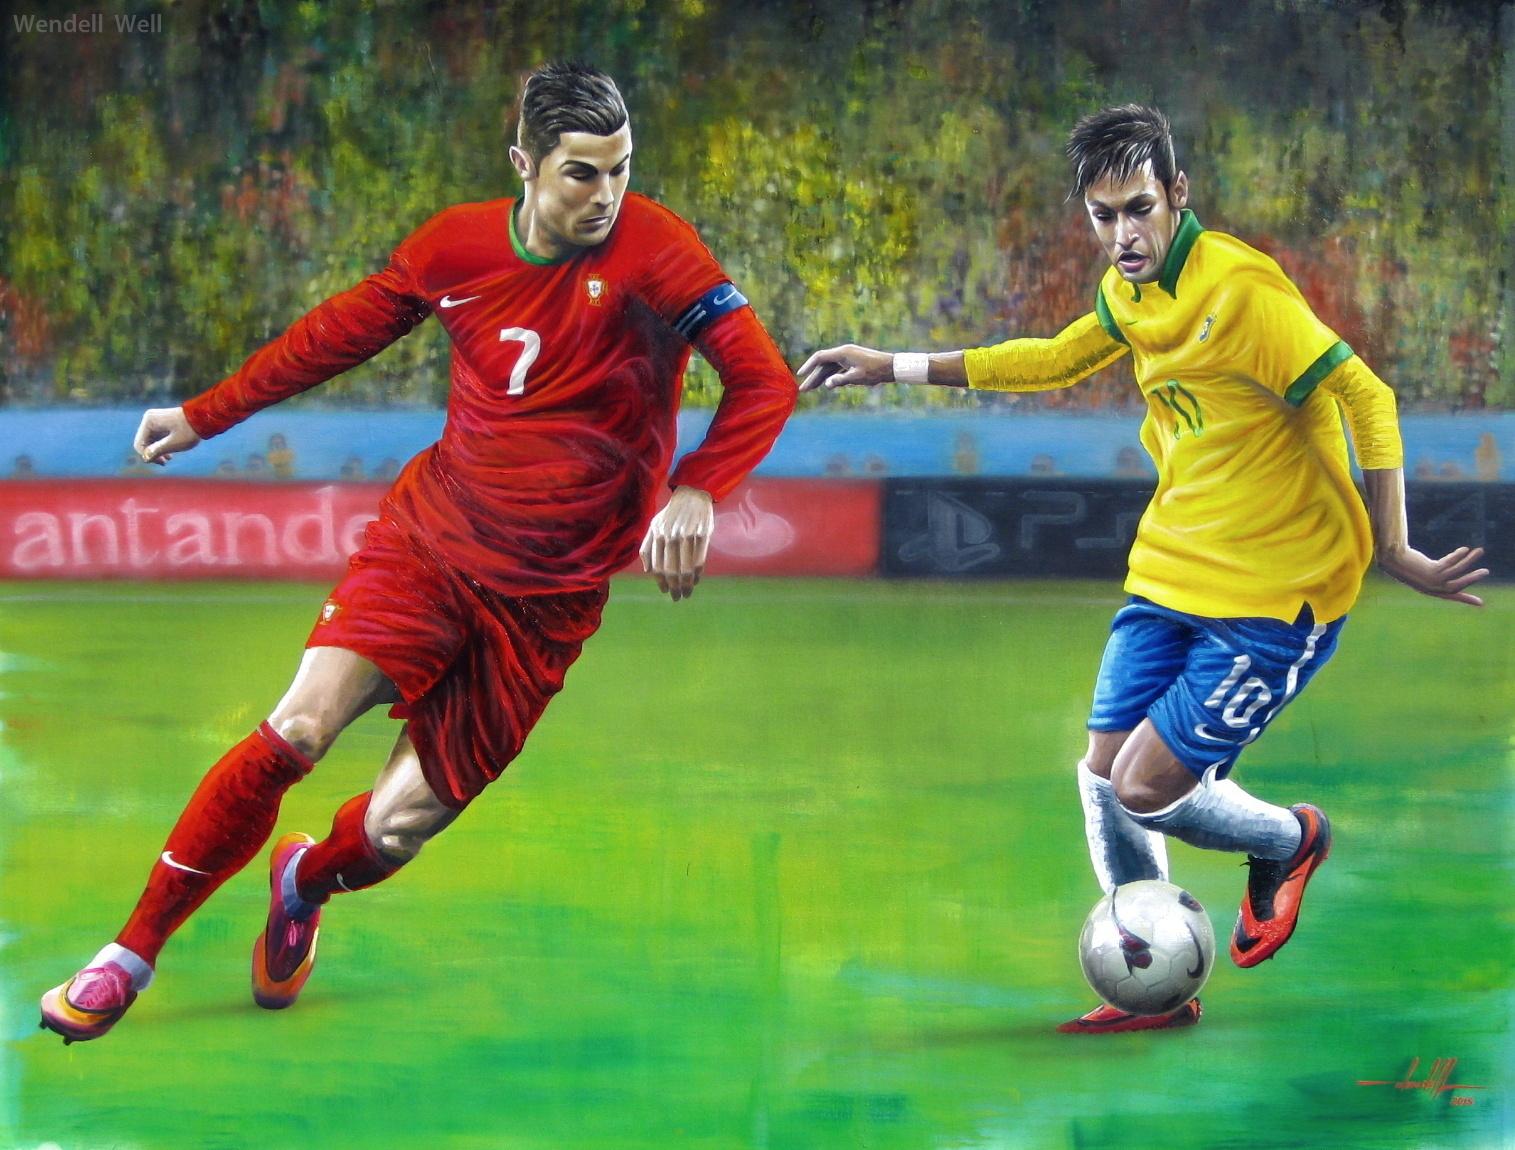 Pintura Neymar e Cristiano Ronaldo